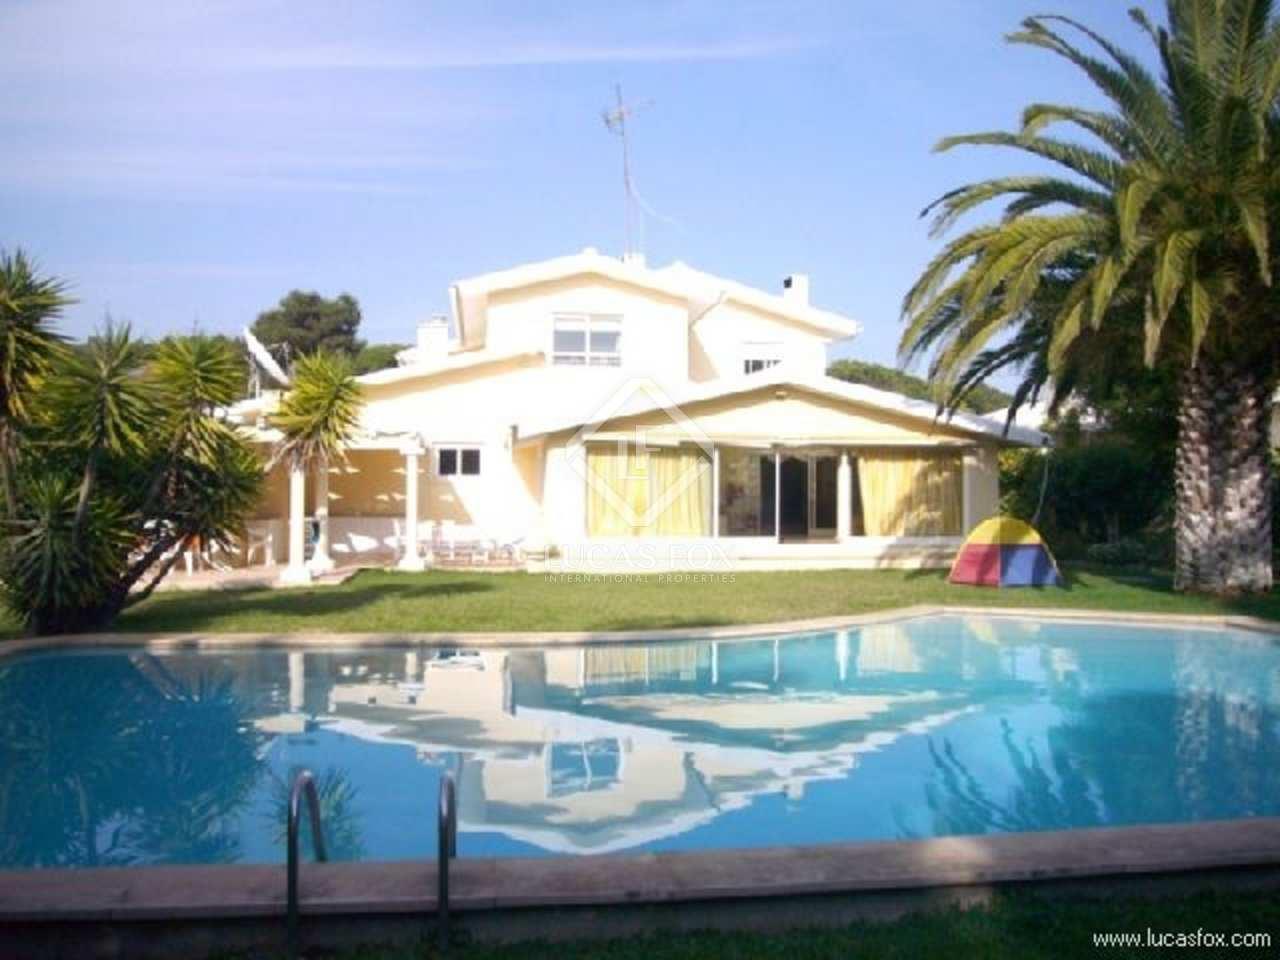 Charming villa for sale in Birre area of Cascais